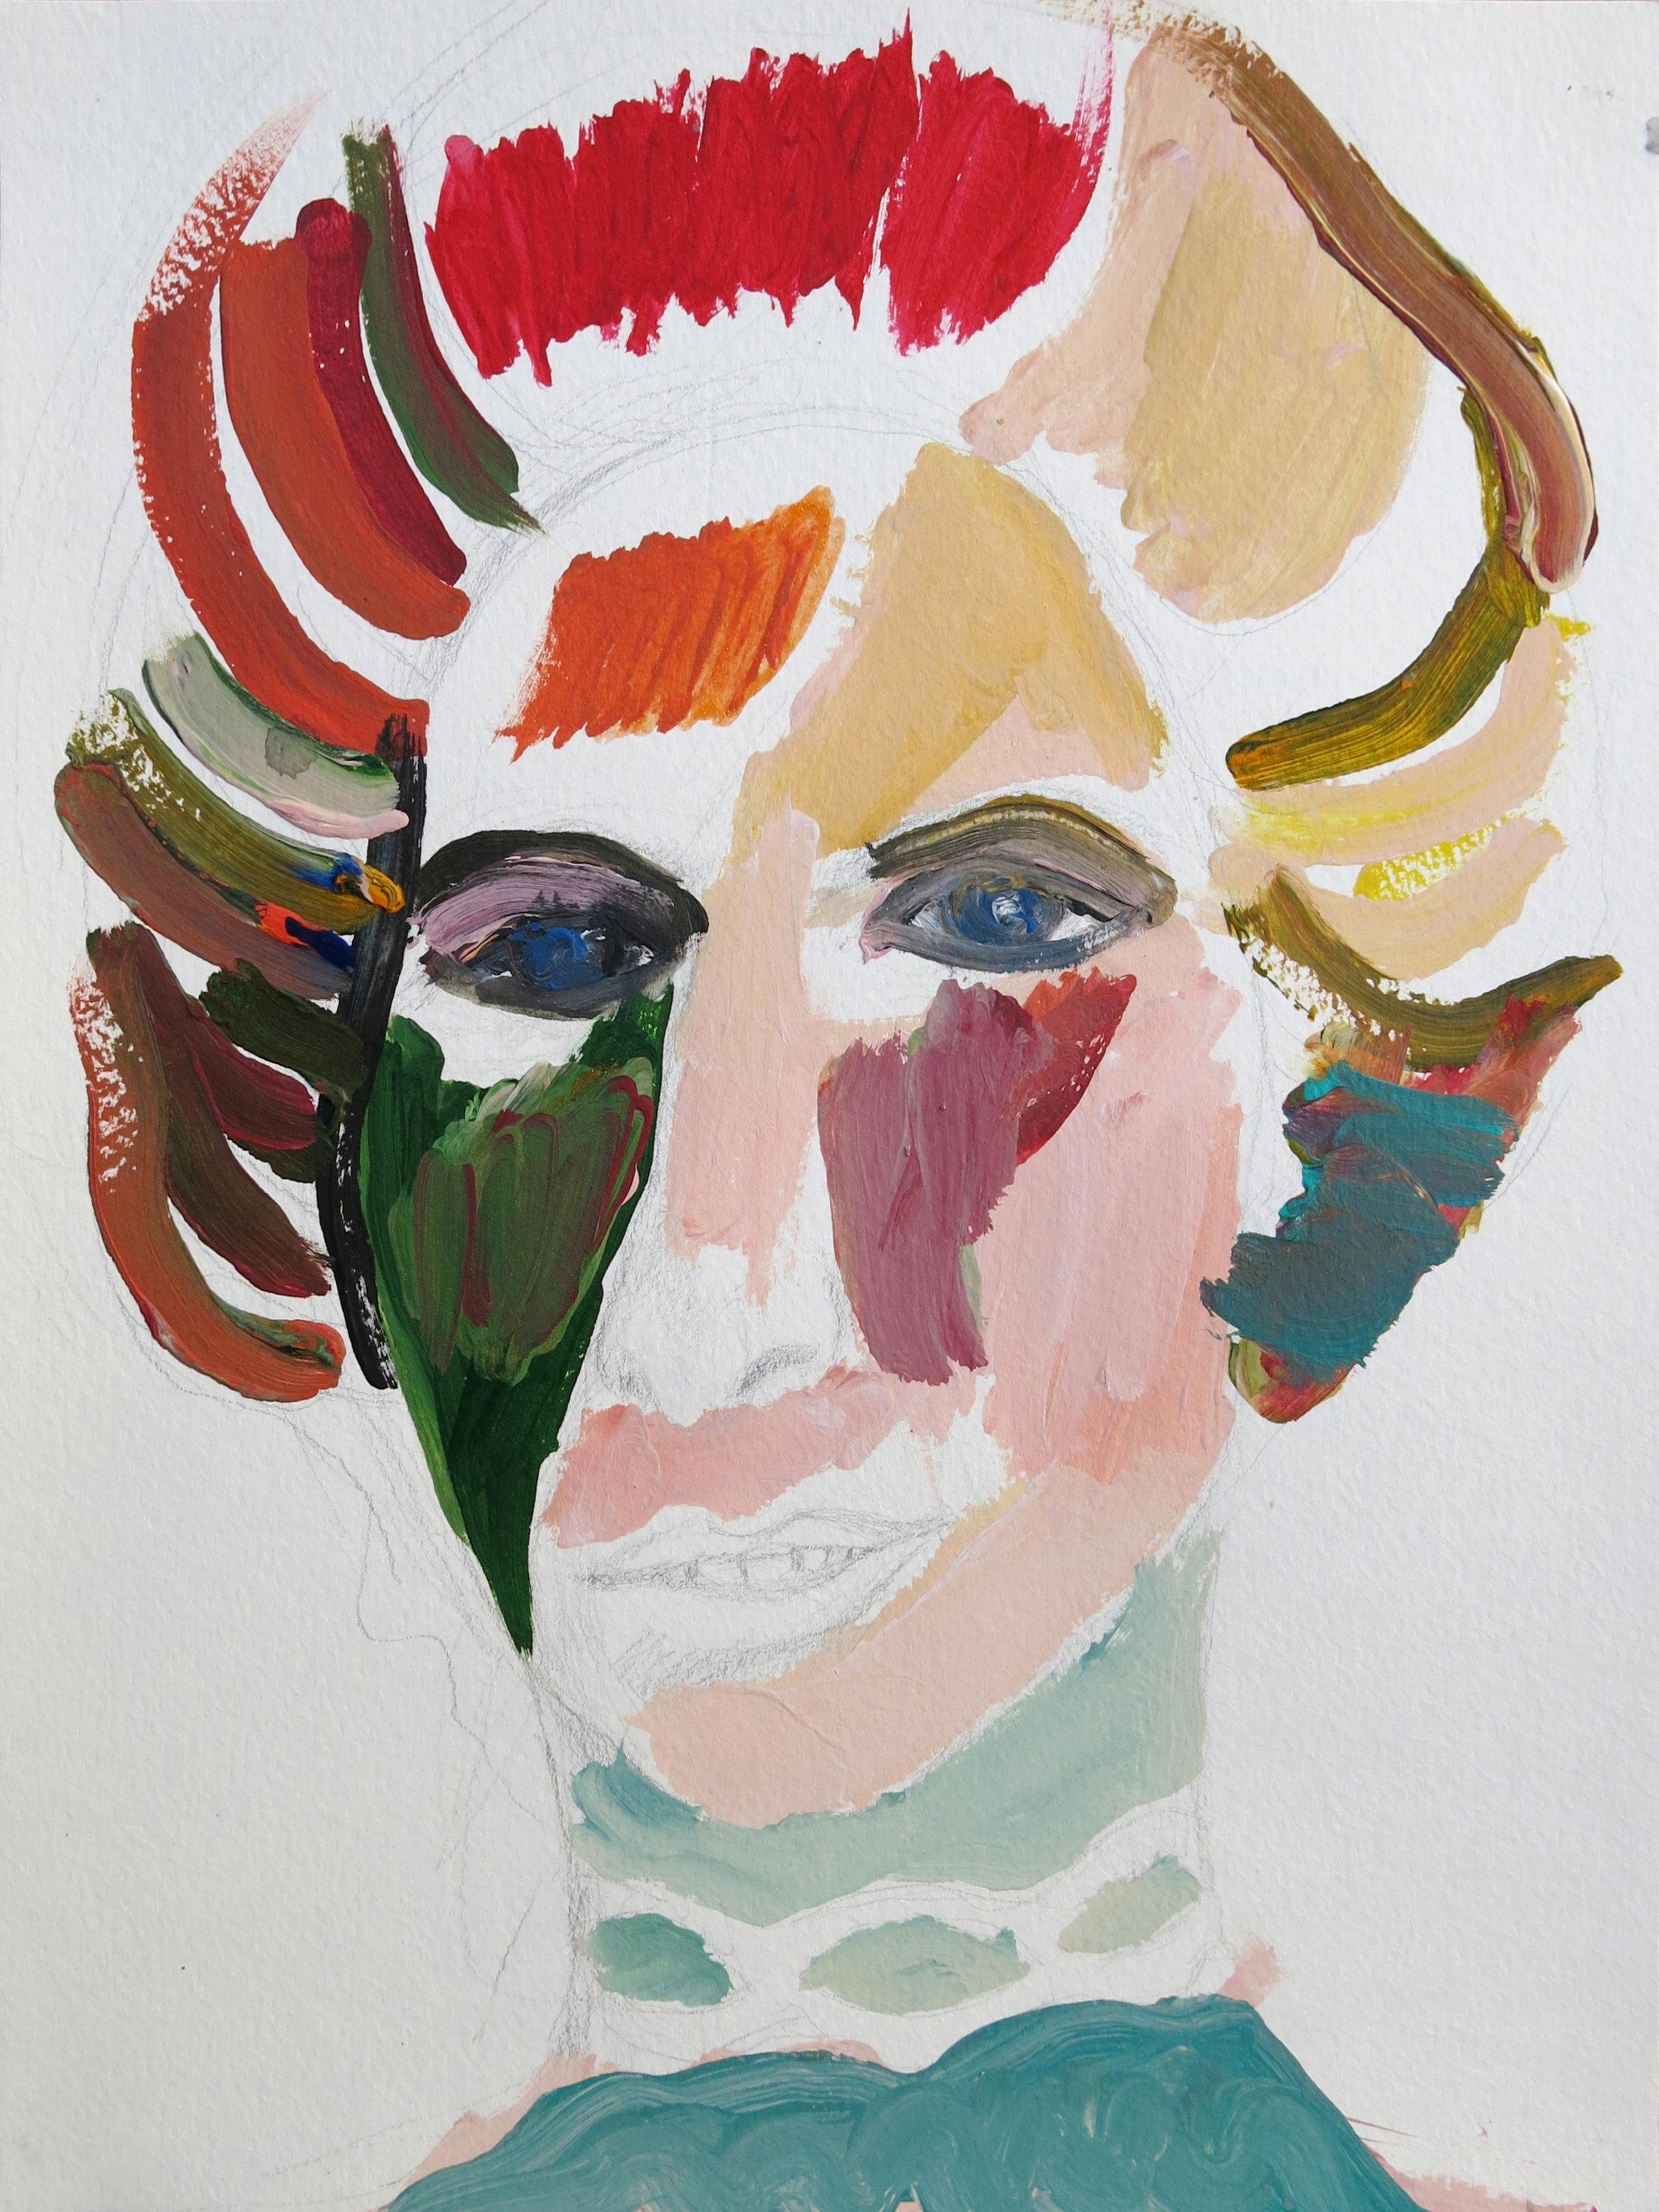 Barbra Streisand Portrait #37